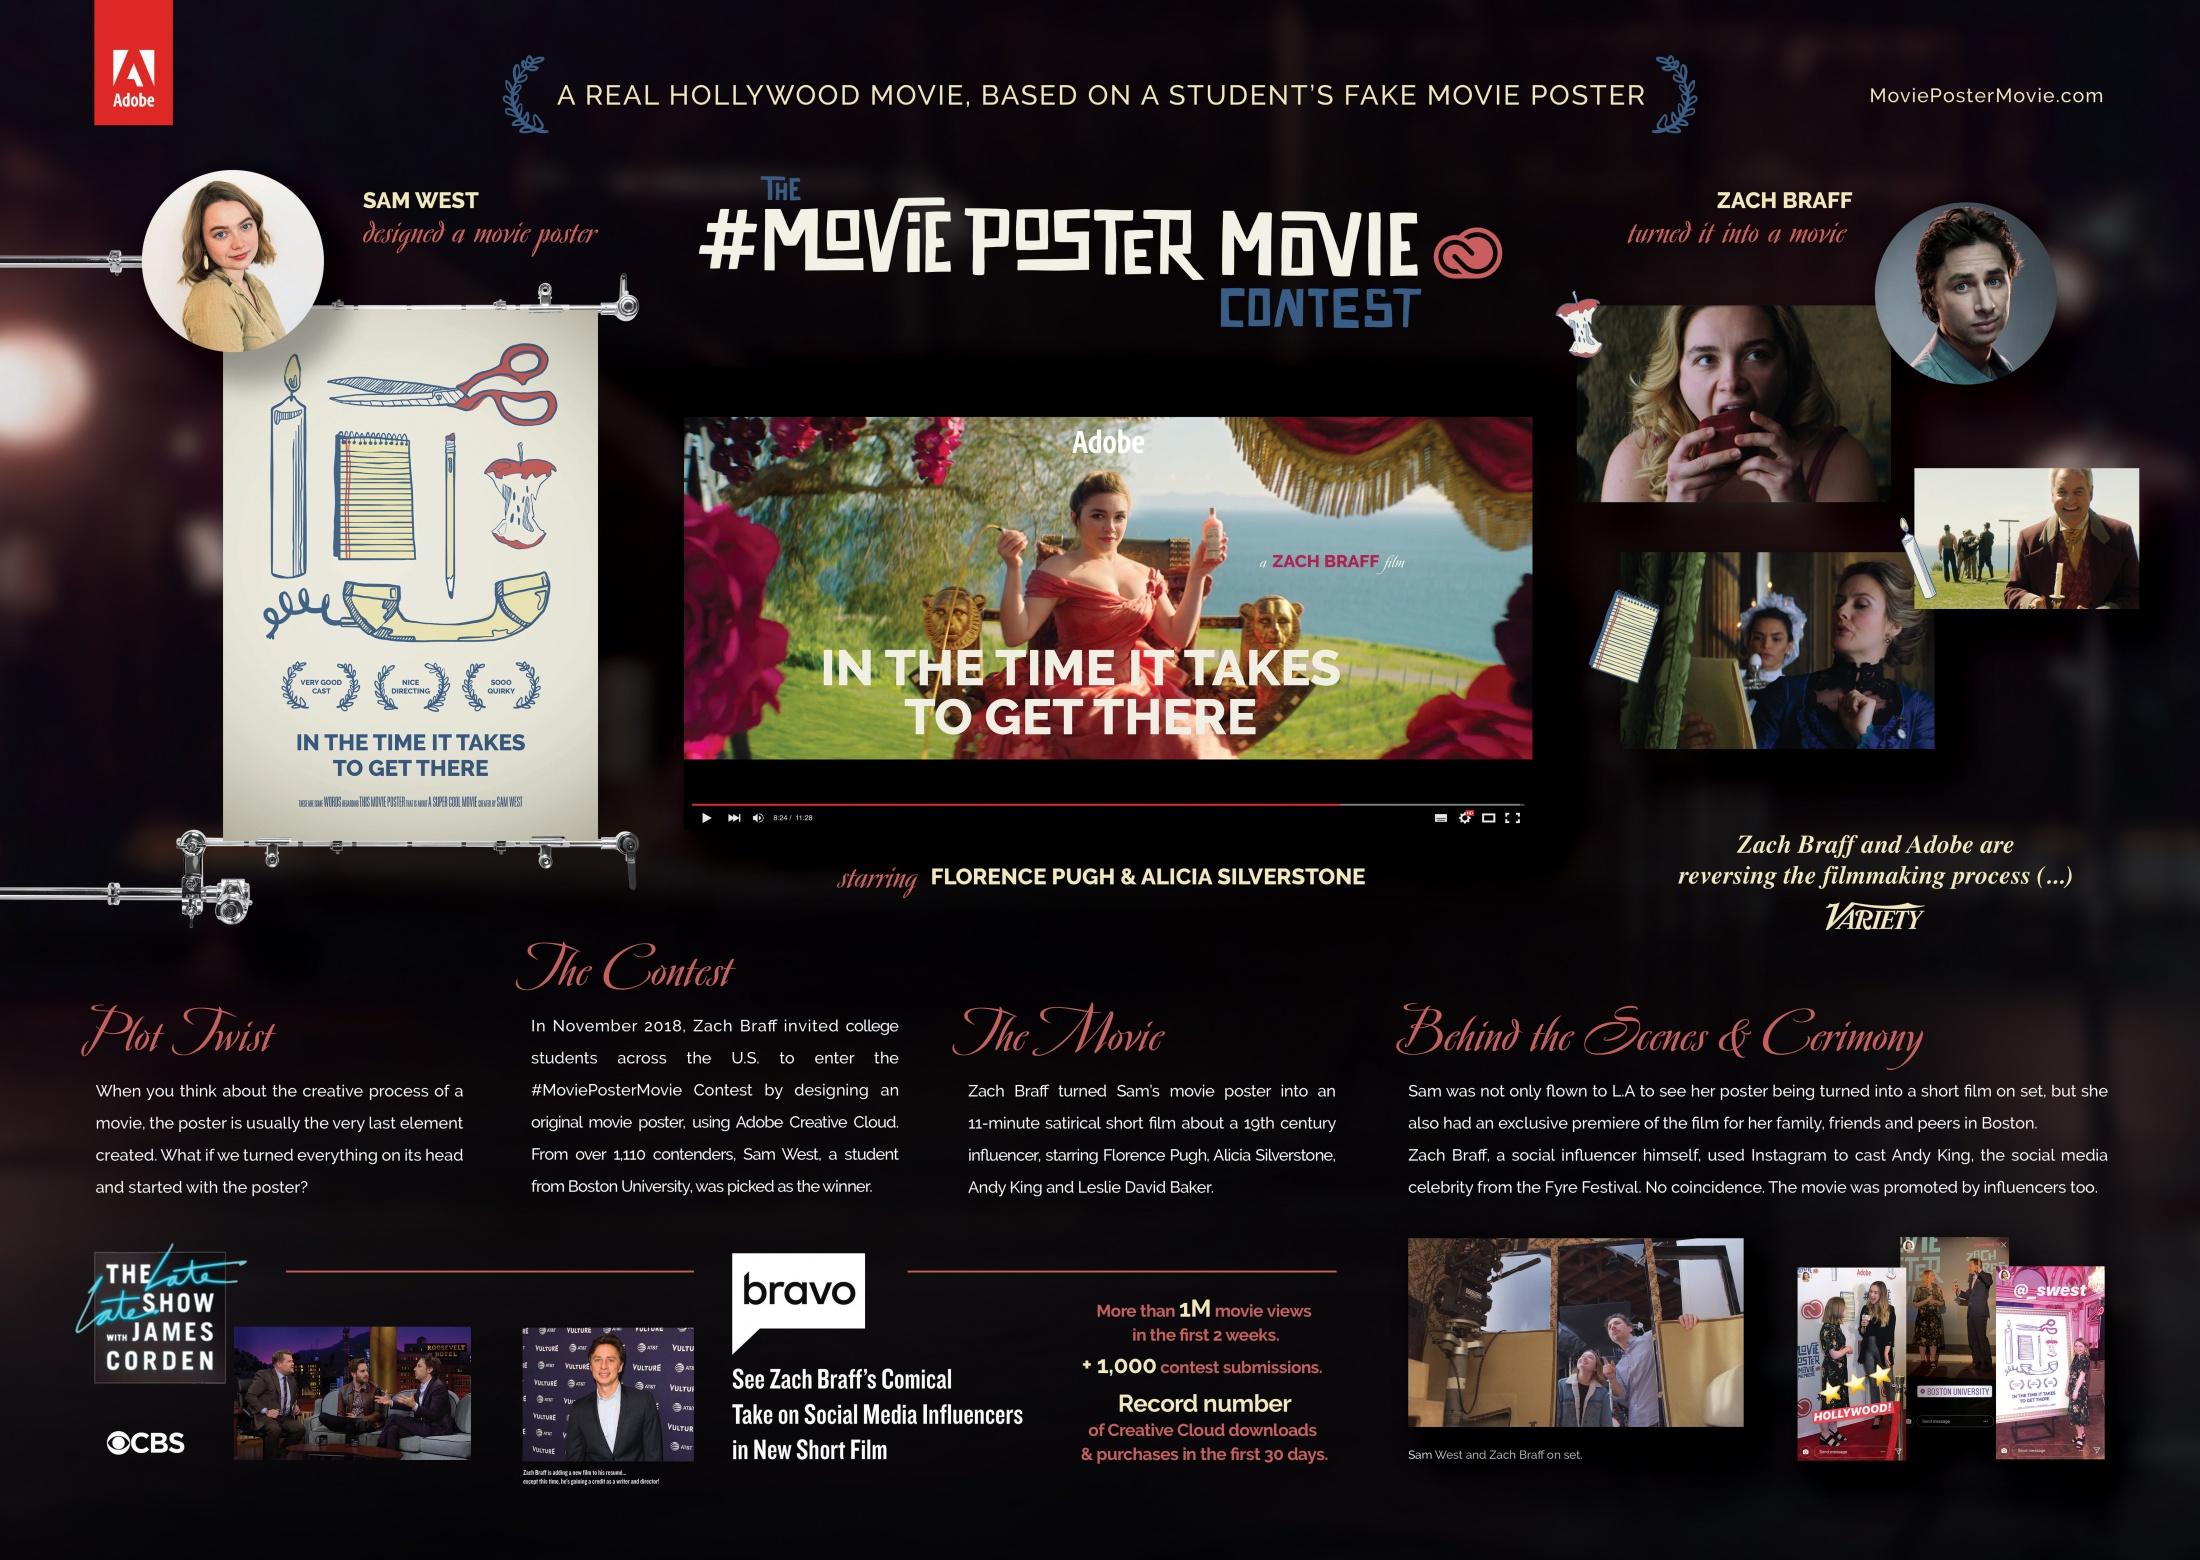 Thumbnail for MoviePosterMovie